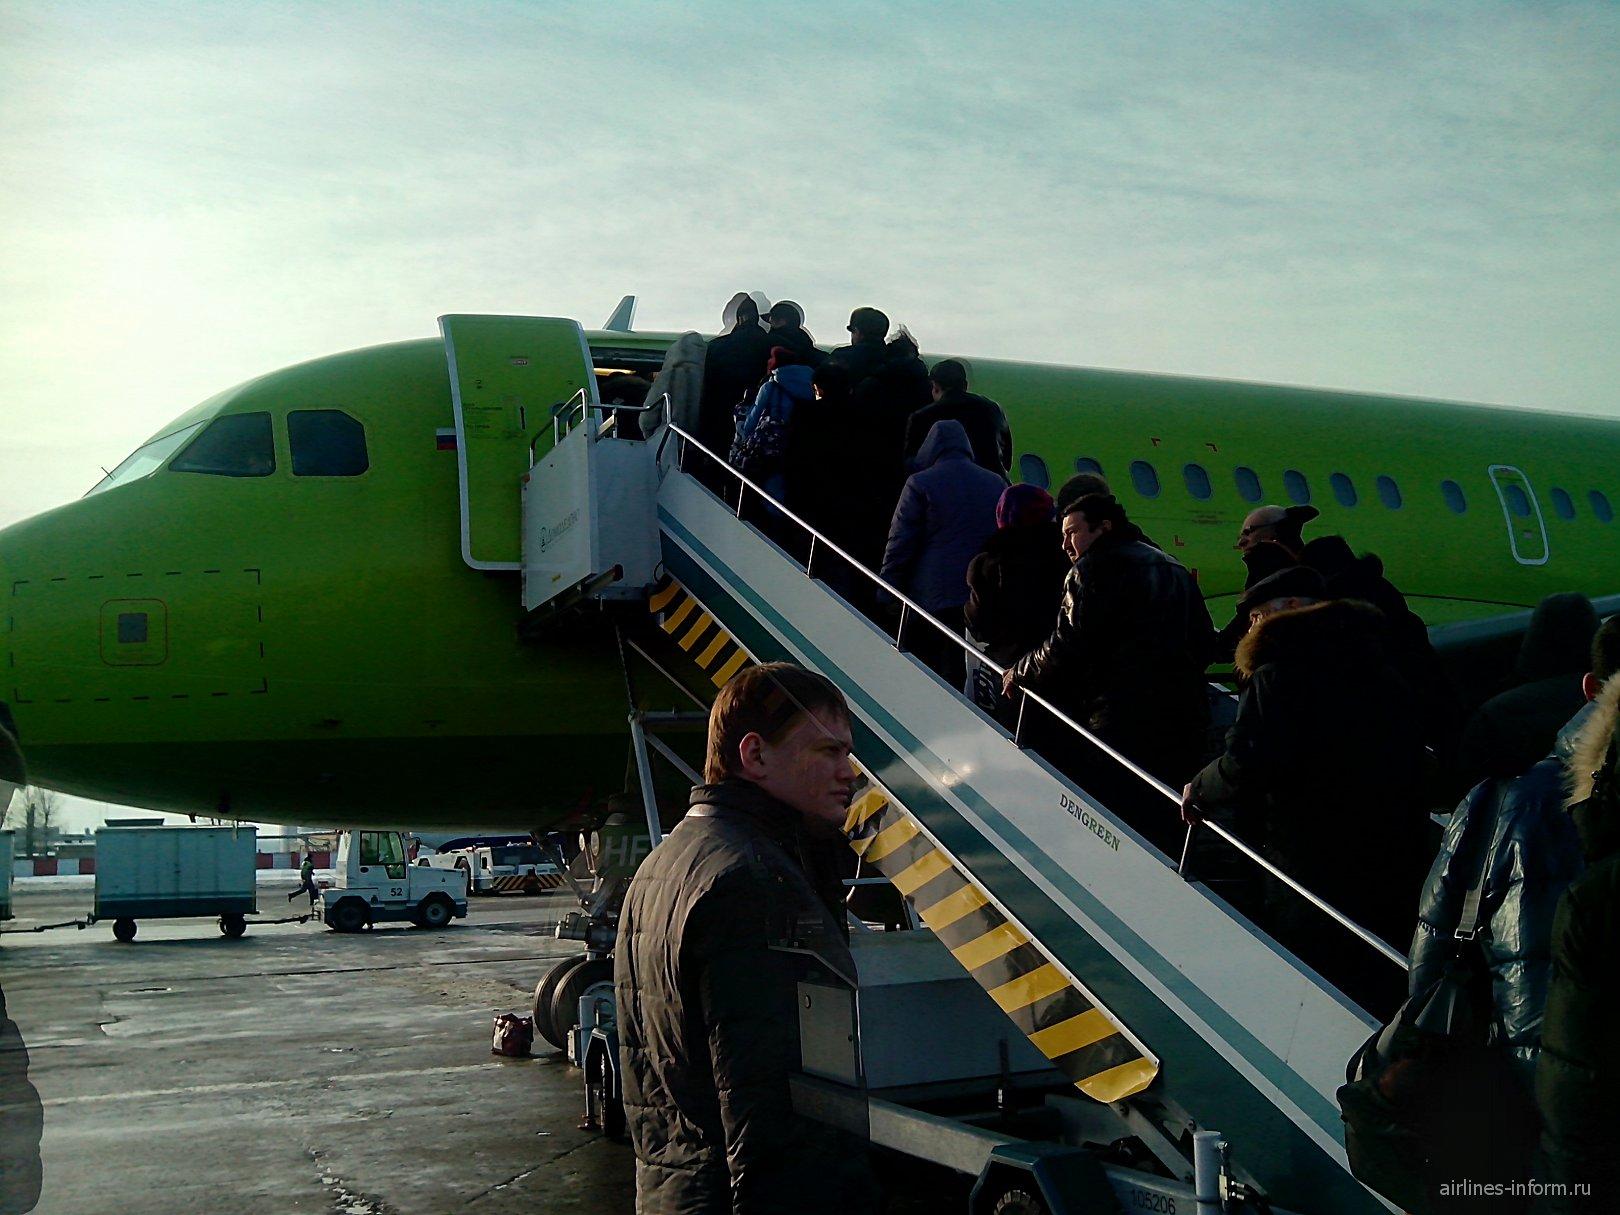 Перелёт Омск-Москва-Владивосток-Москва-Омск. Часть четвертая: S7, Москва-Омск